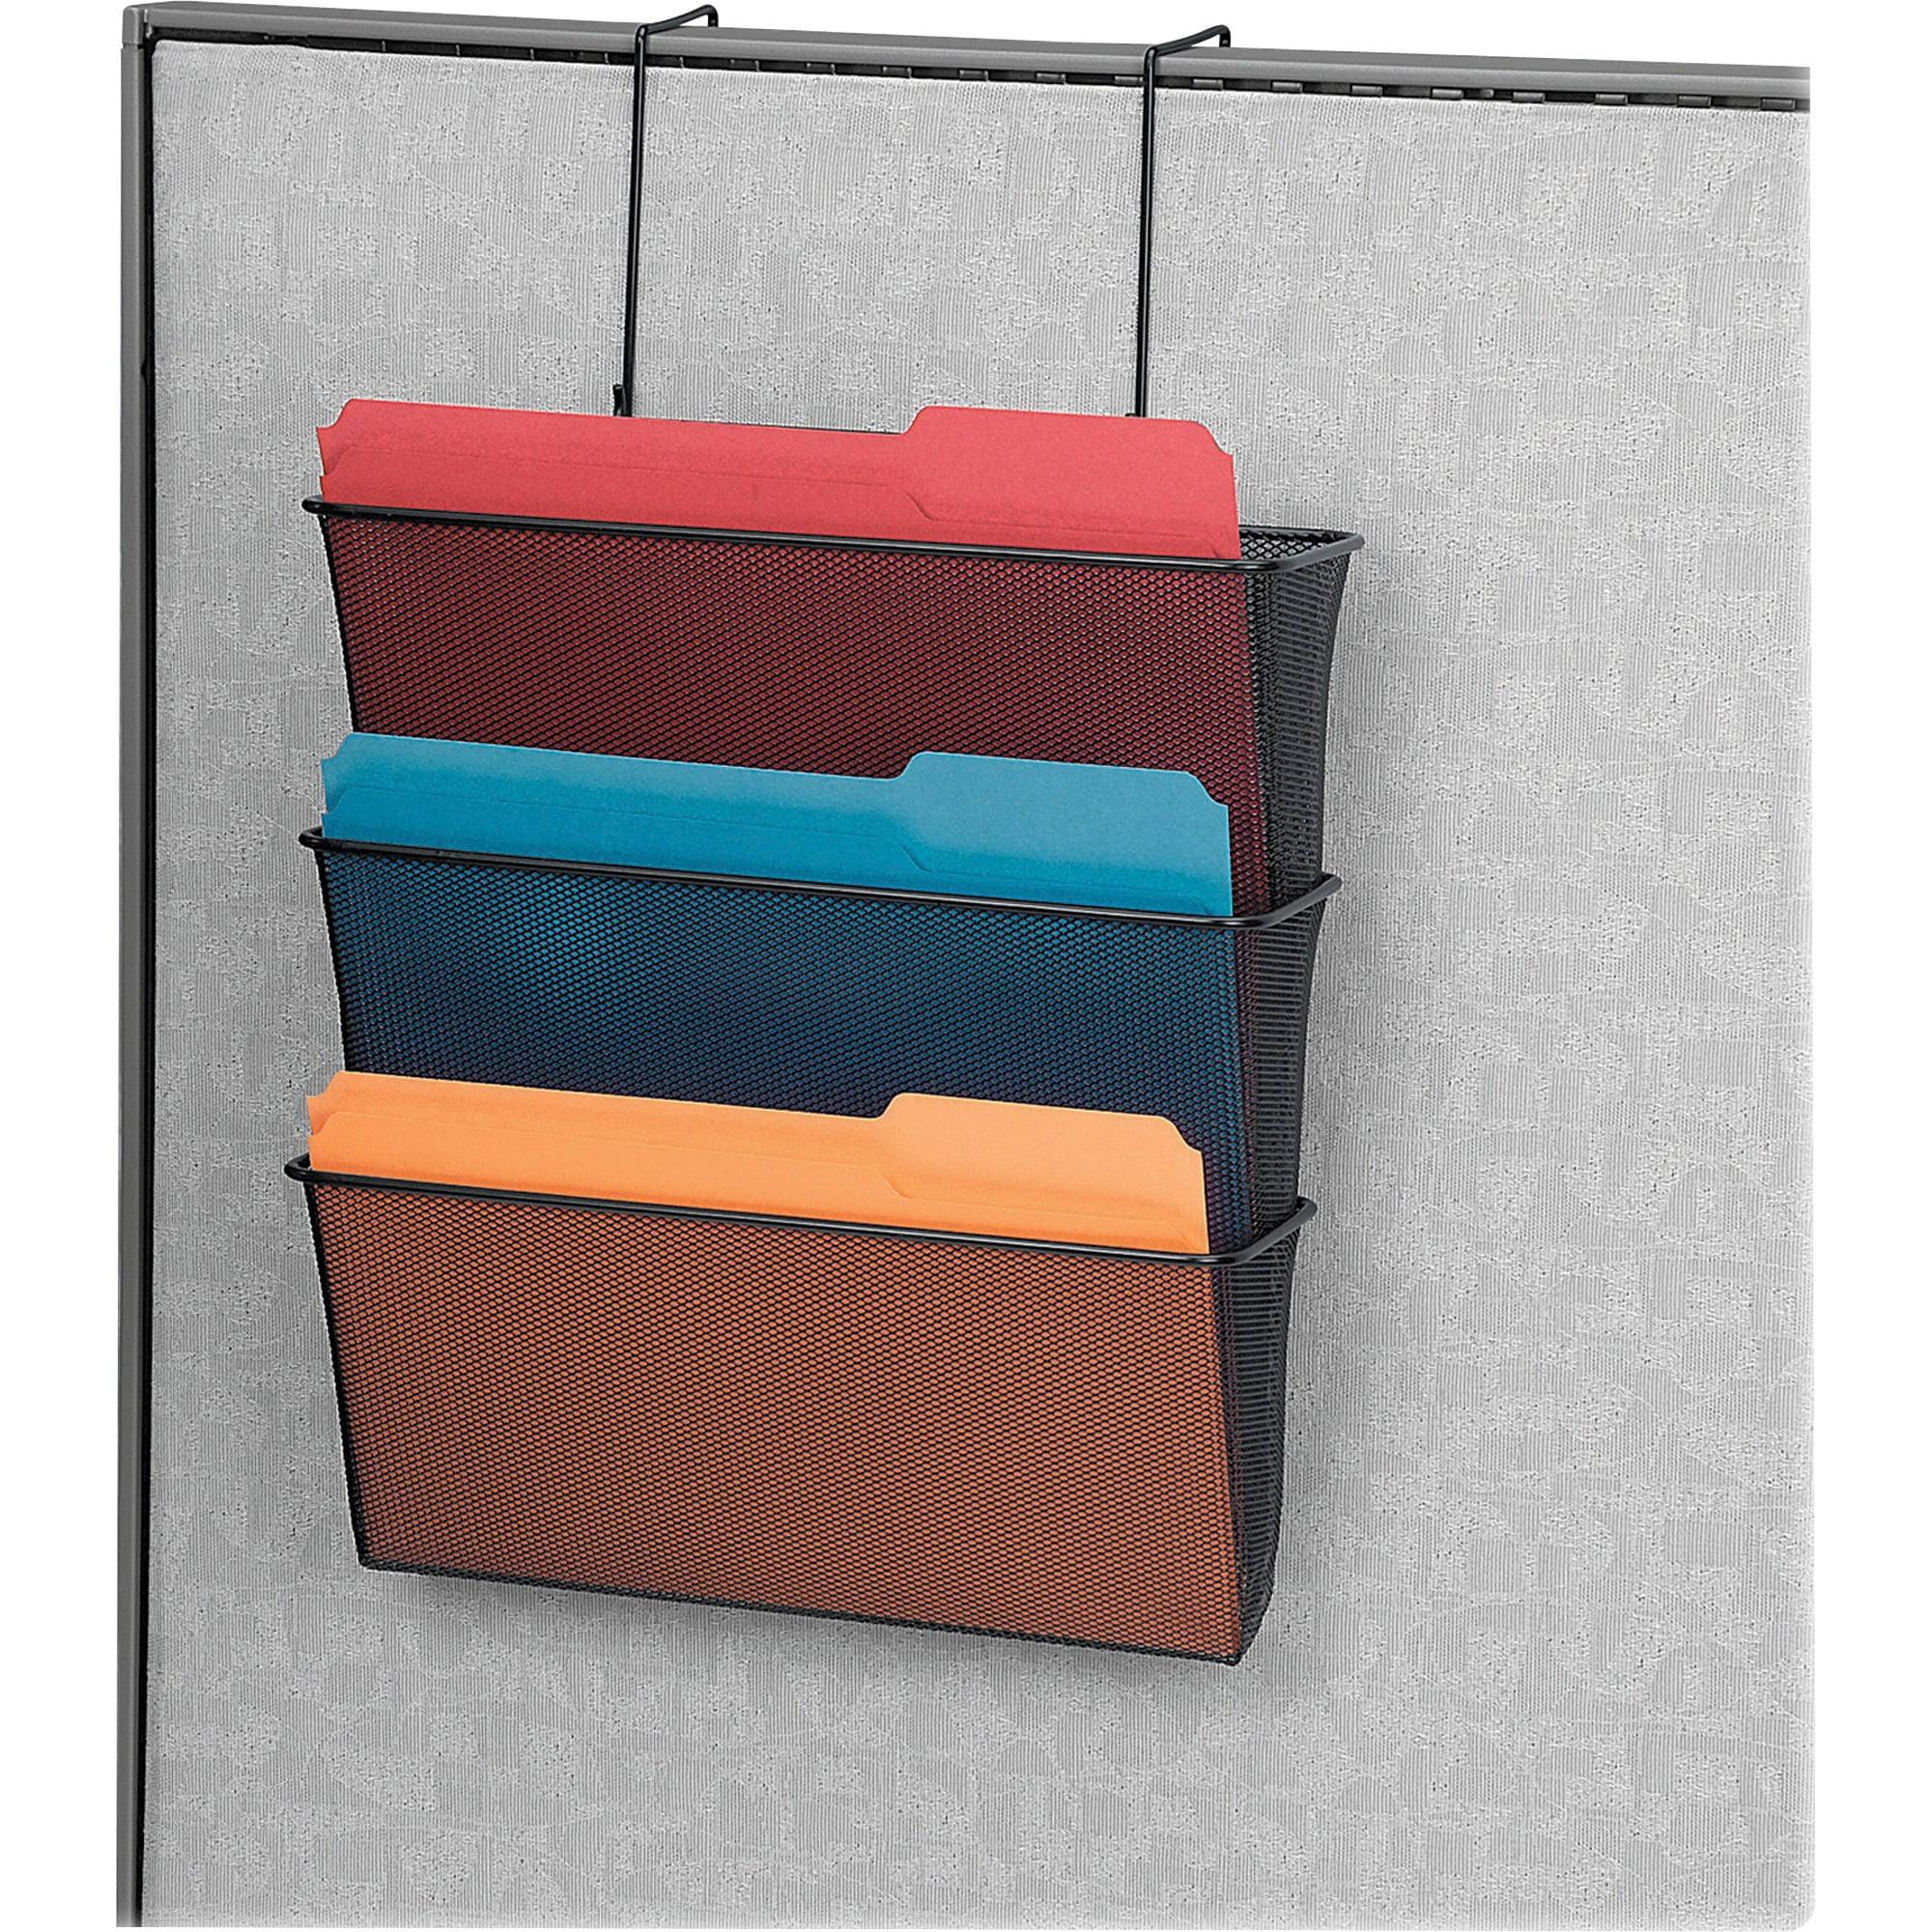 Fellowes, FEL75901, Partition Mesh Triple File Pockets, 1 Each, Black